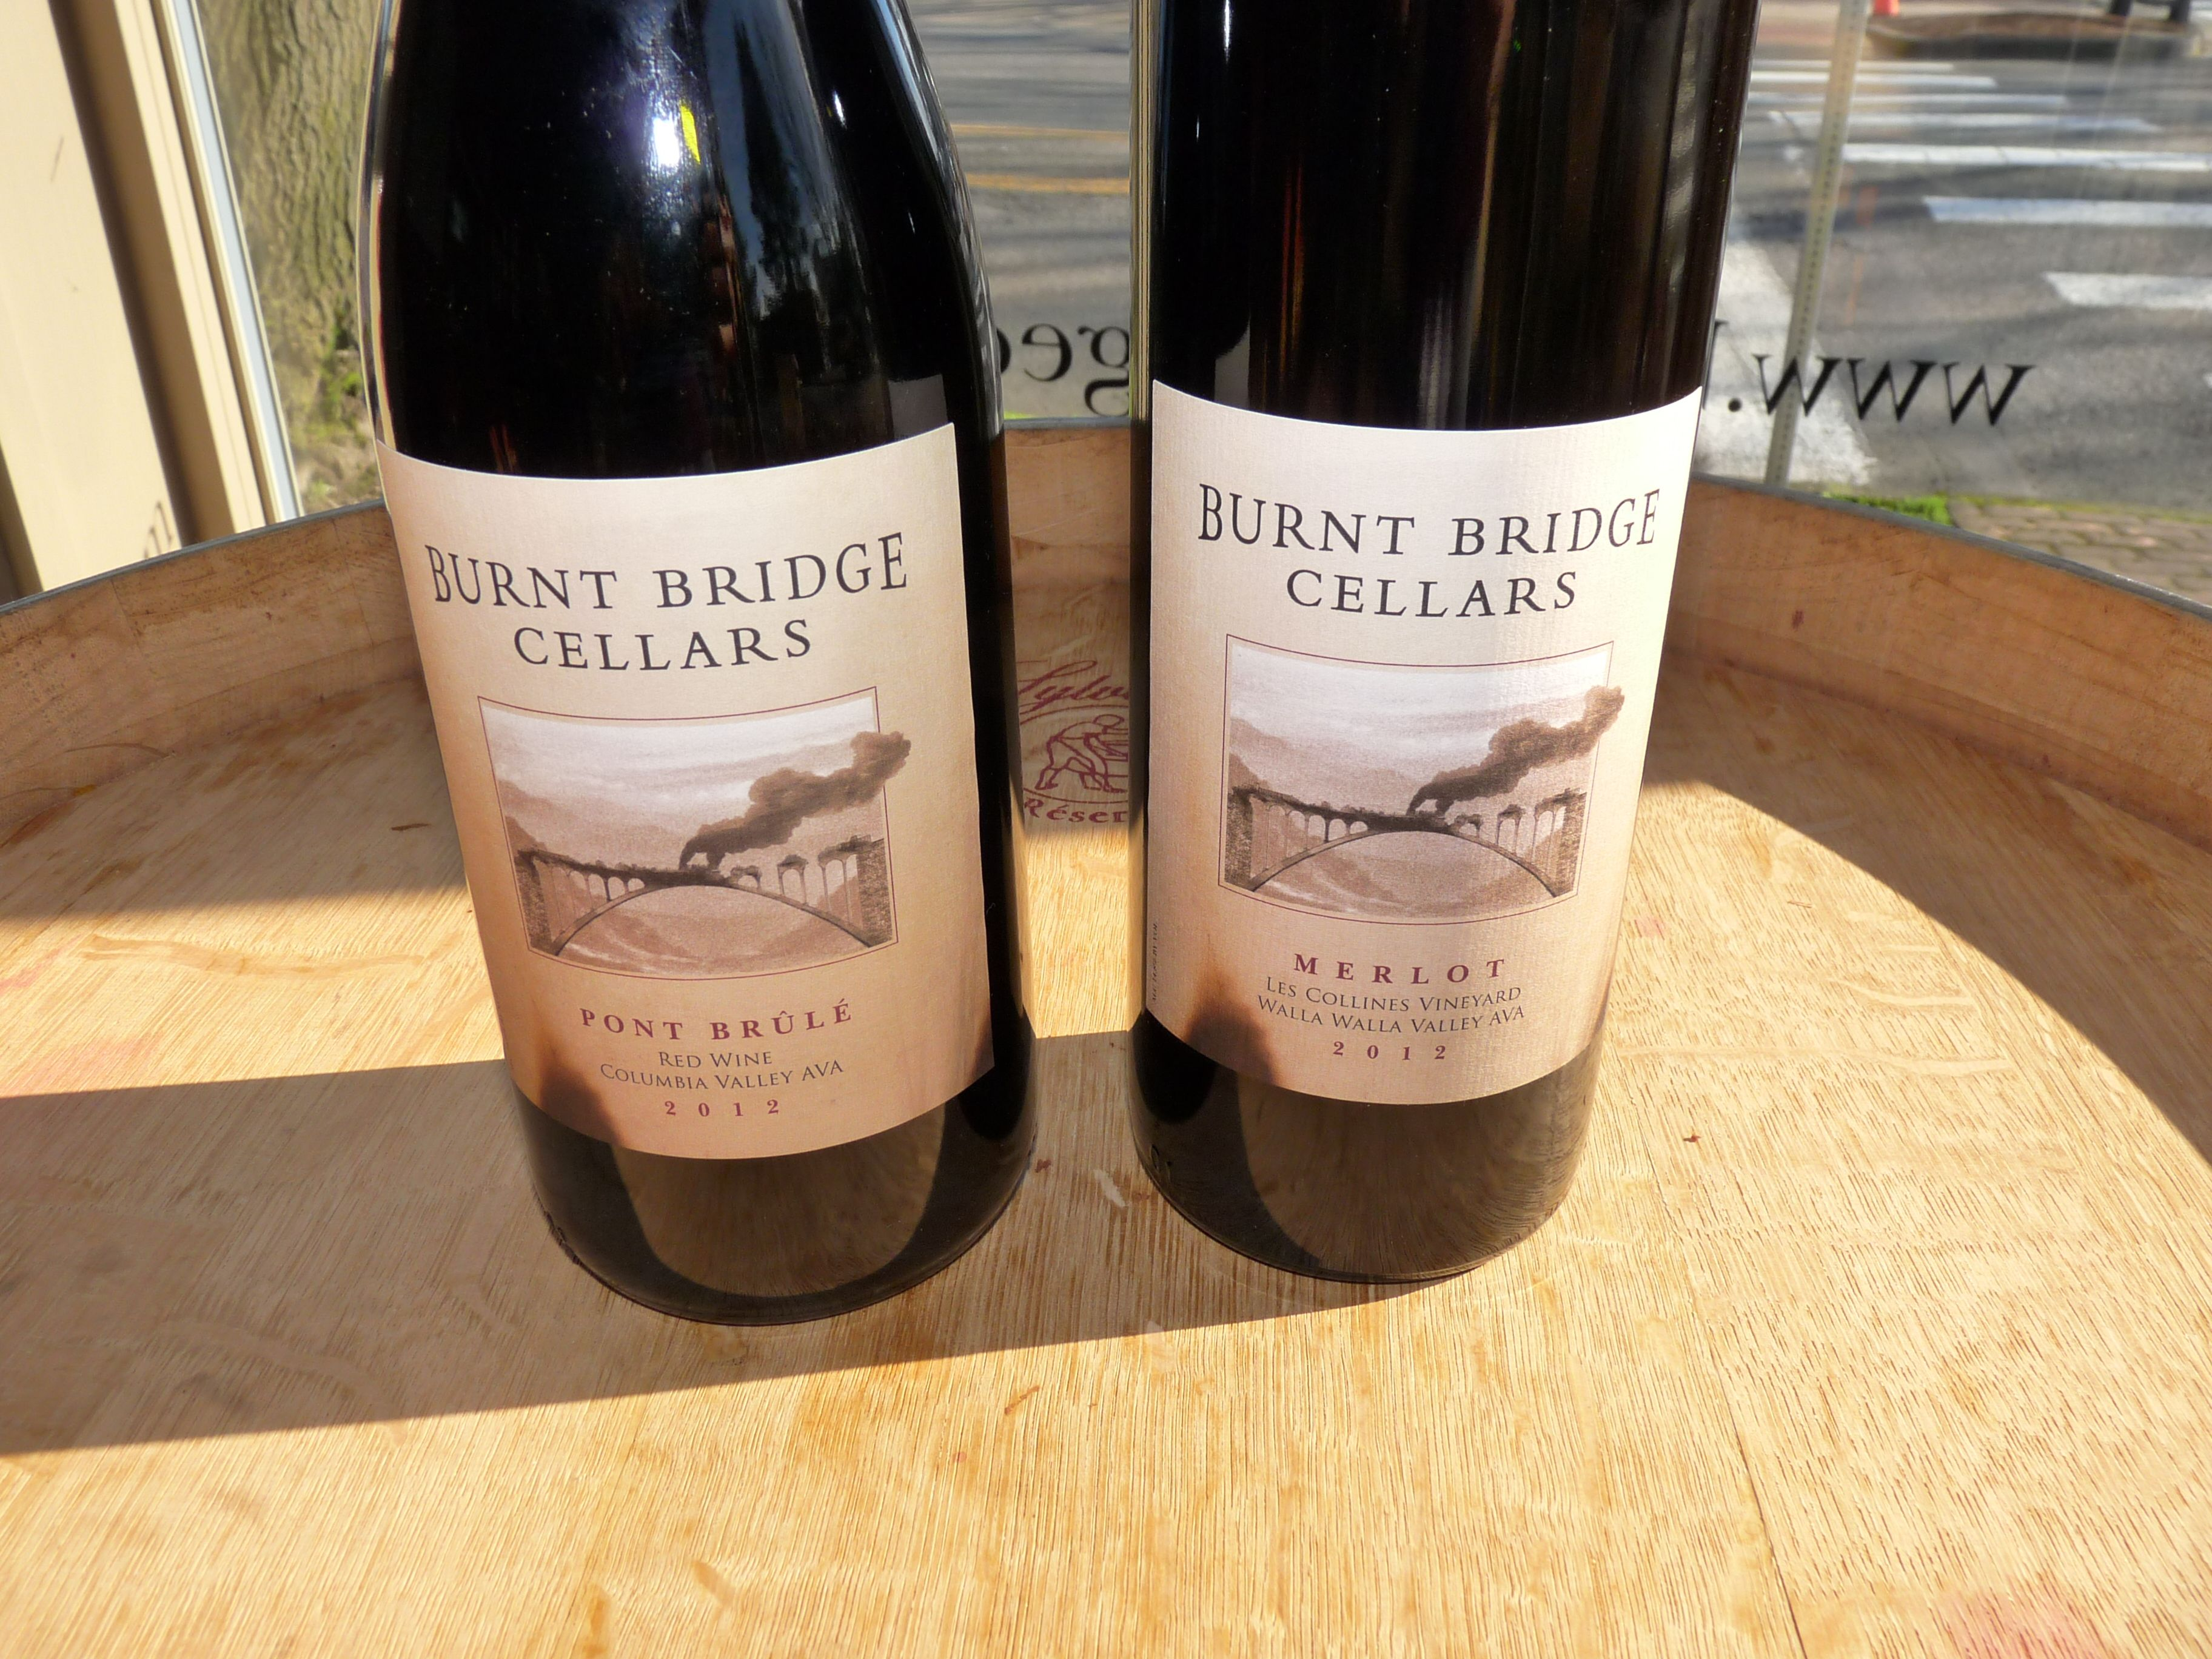 Enjoy award-winning wines at Vancouver's only urban winery-Burnt Bridge Cellars-all weekend long. Viki Eierdam #WAwine #Wine #Travel